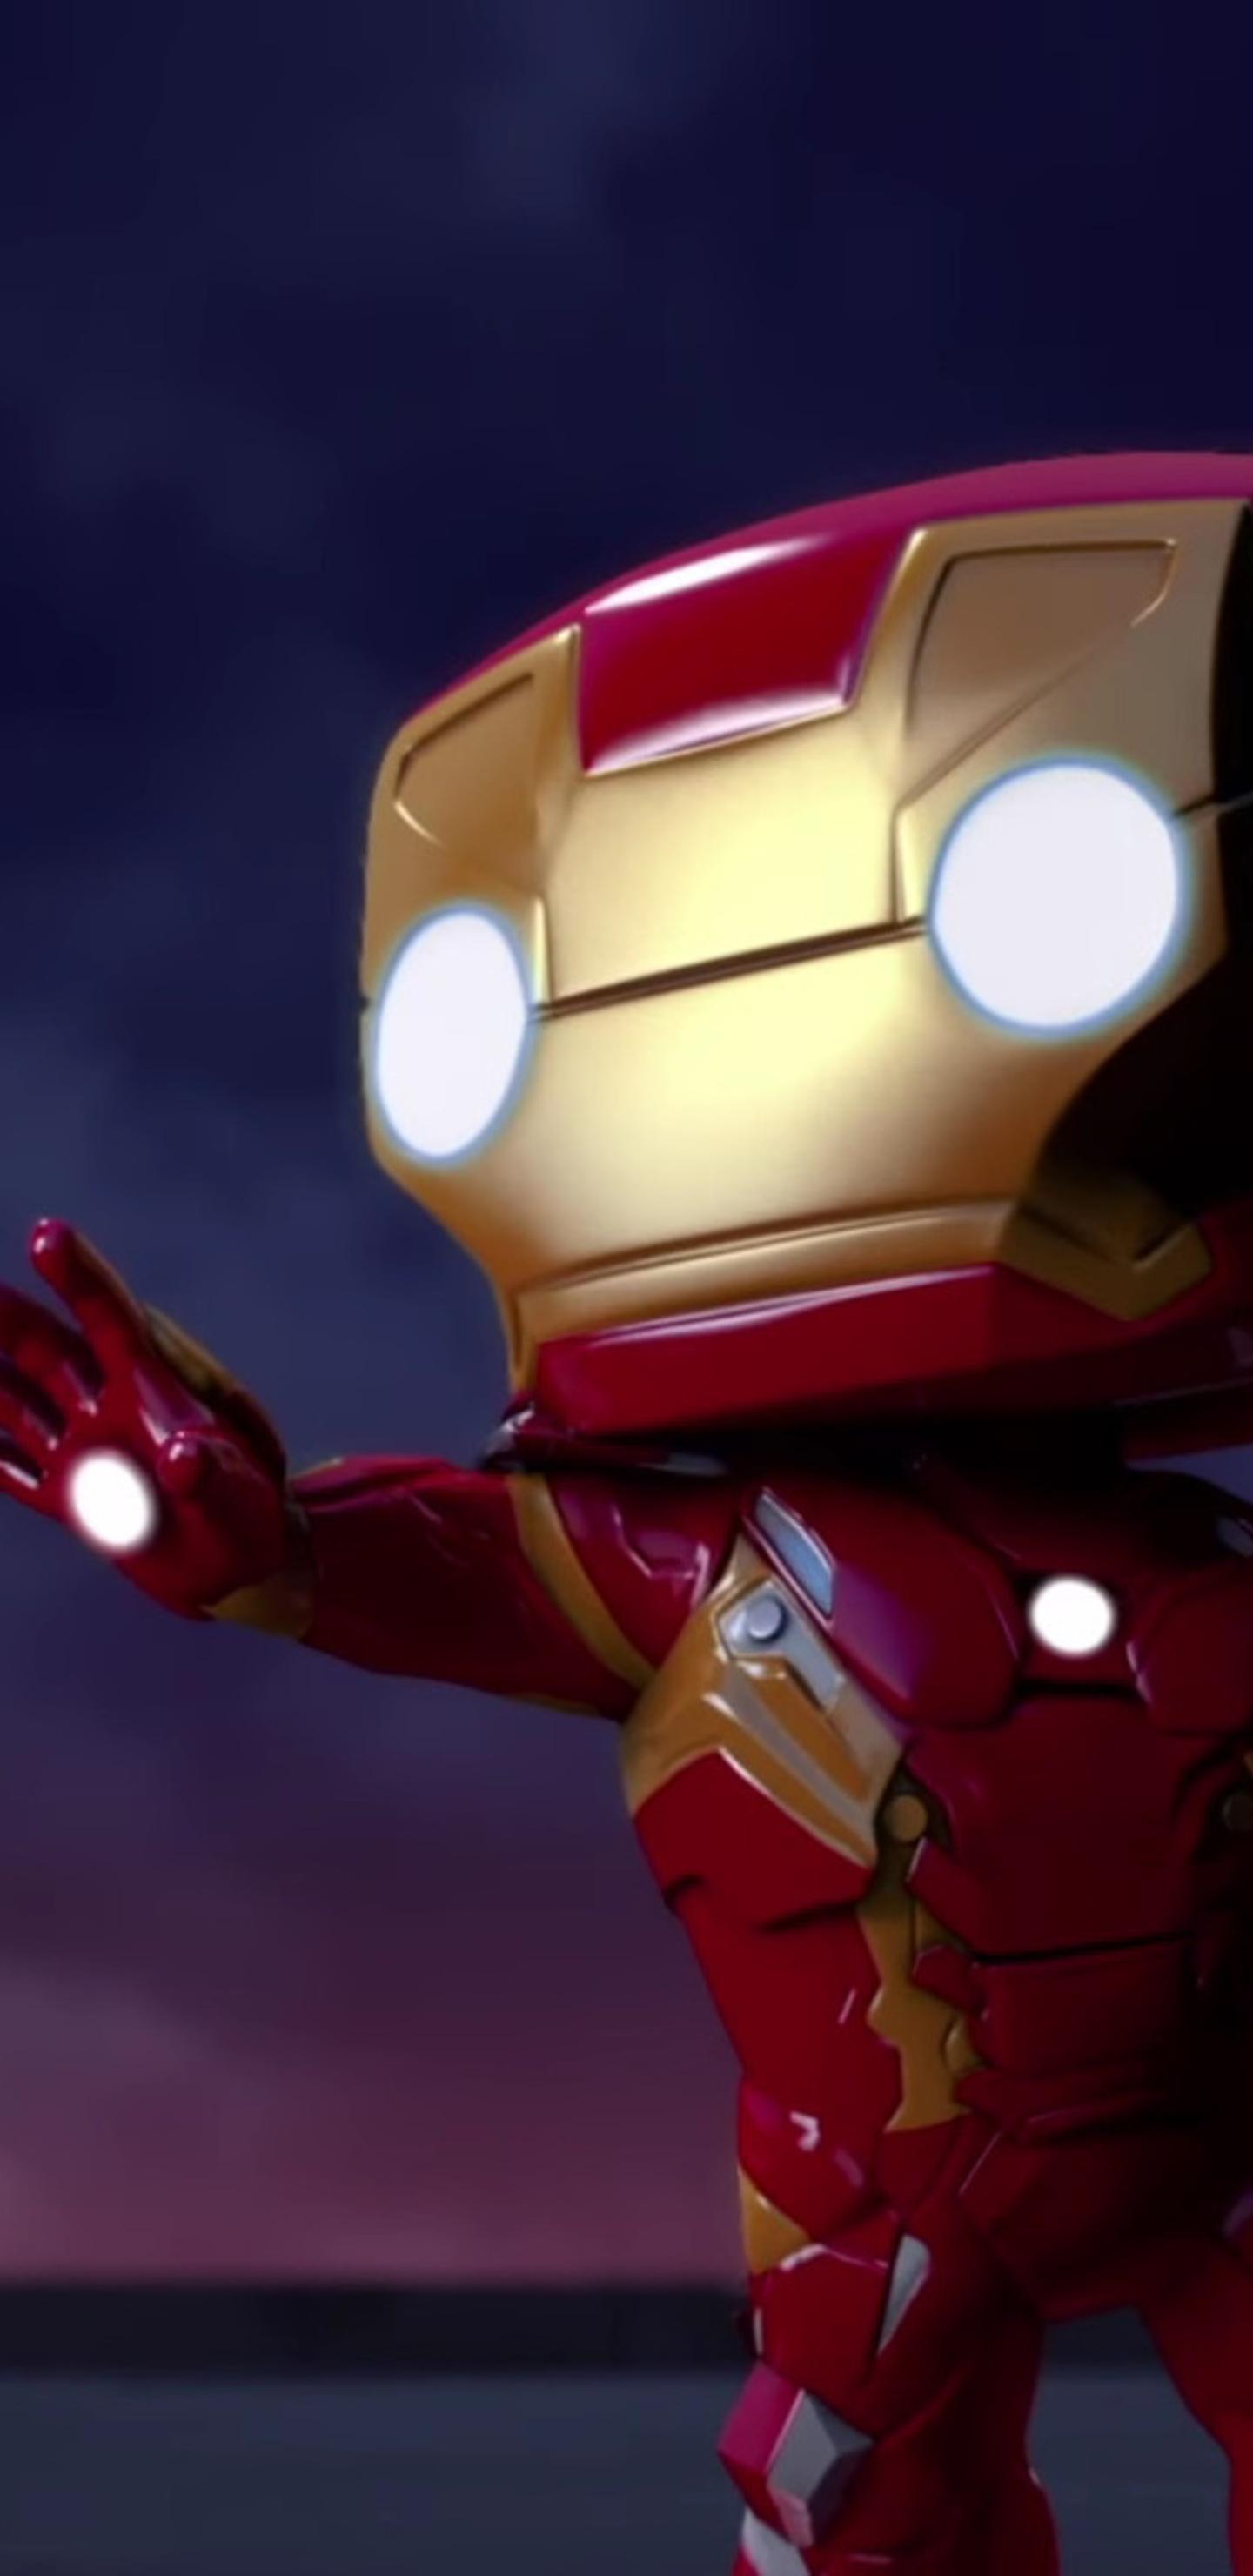 1440x2960 Iron Man Spellbound Animated Movie Samsung Galaxy